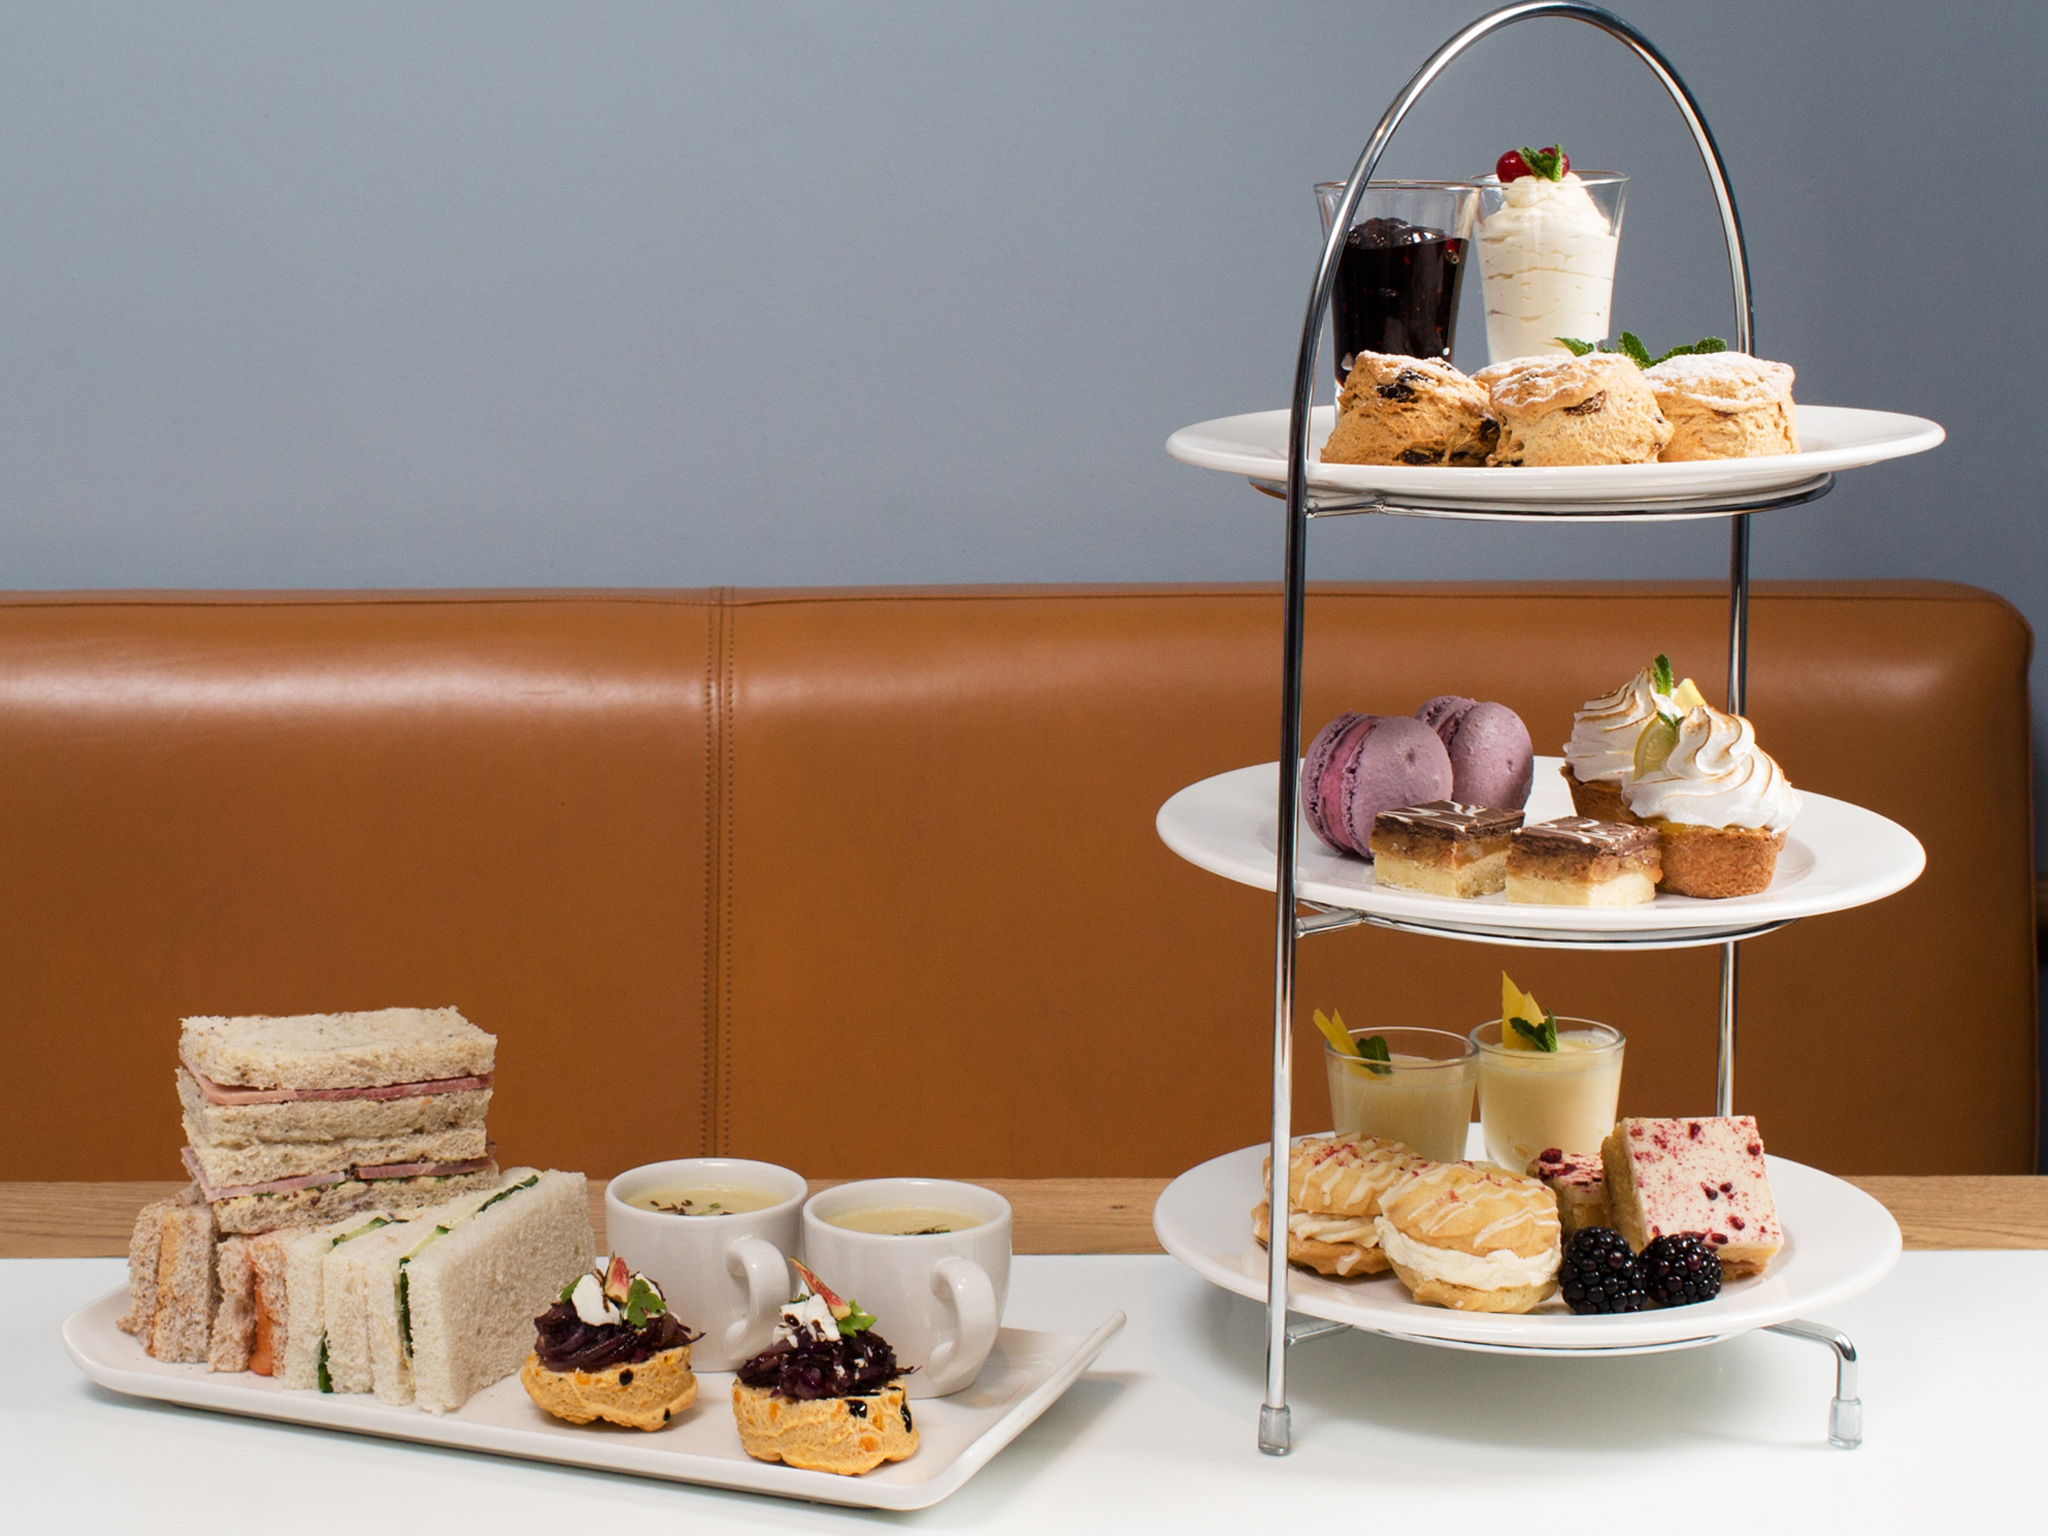 Afternoon tea at Café Portrait in Edinburgh